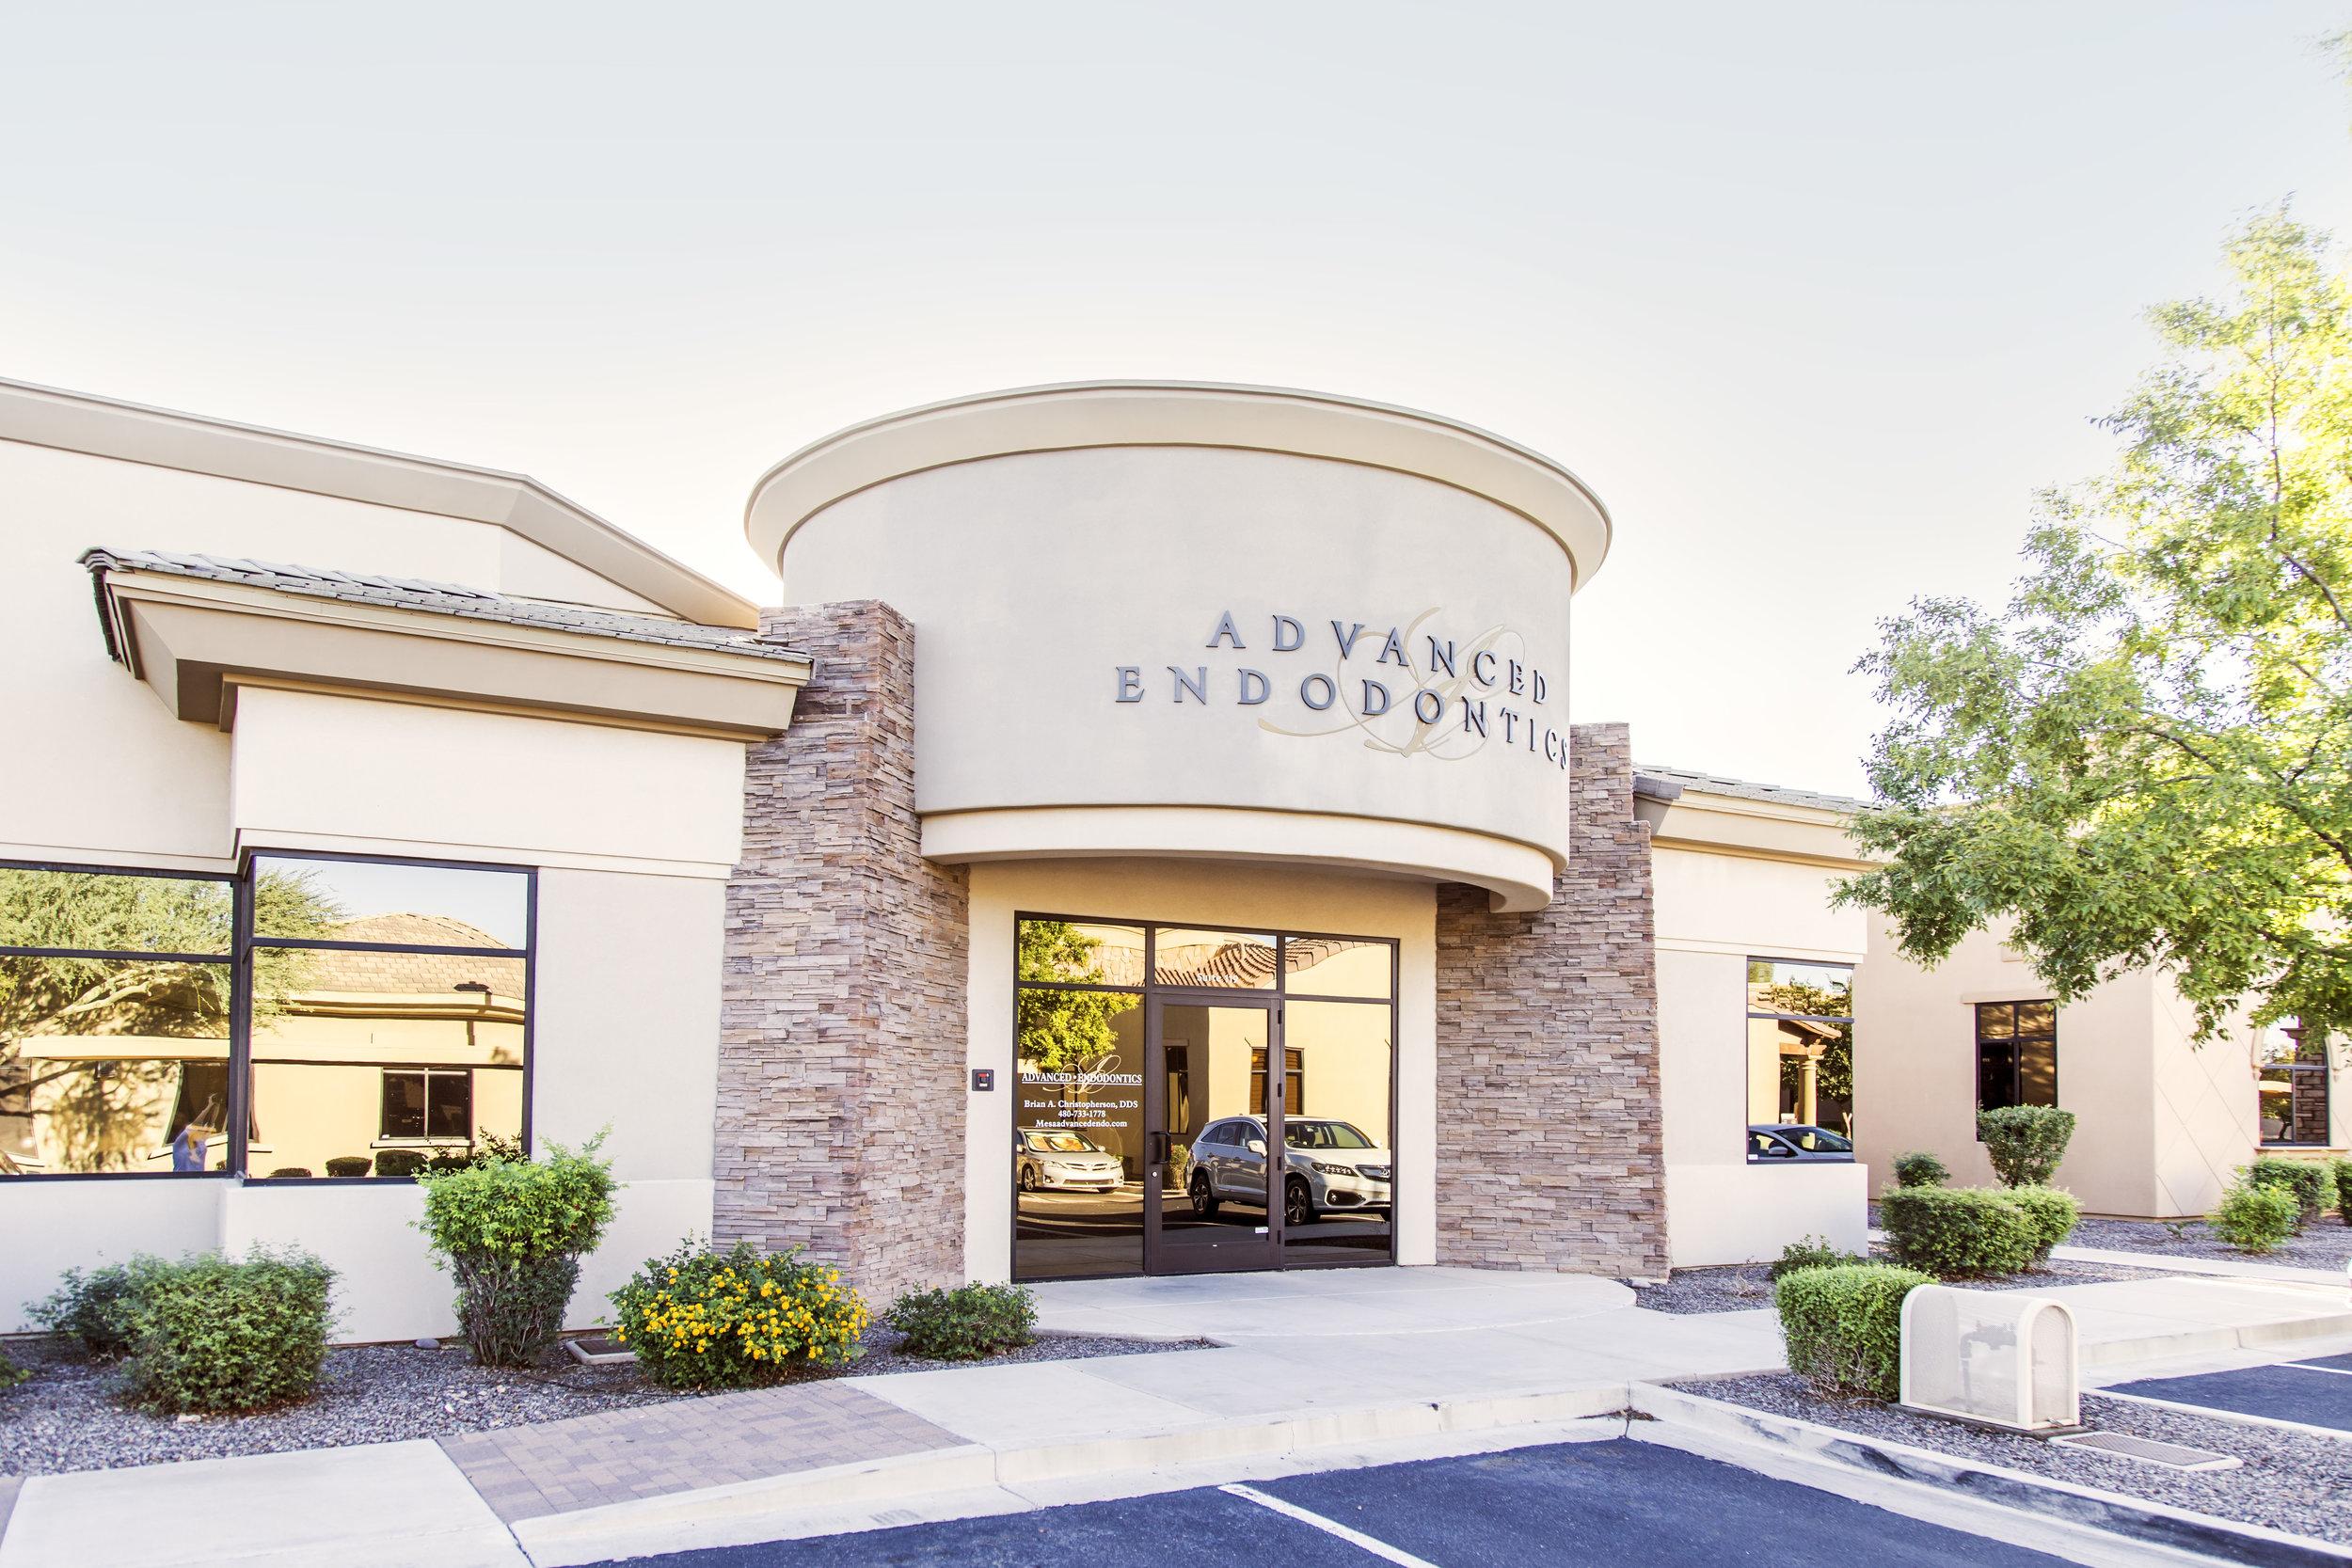 Advanced Endodontics Office-Jessica Bowles-4532.jpg